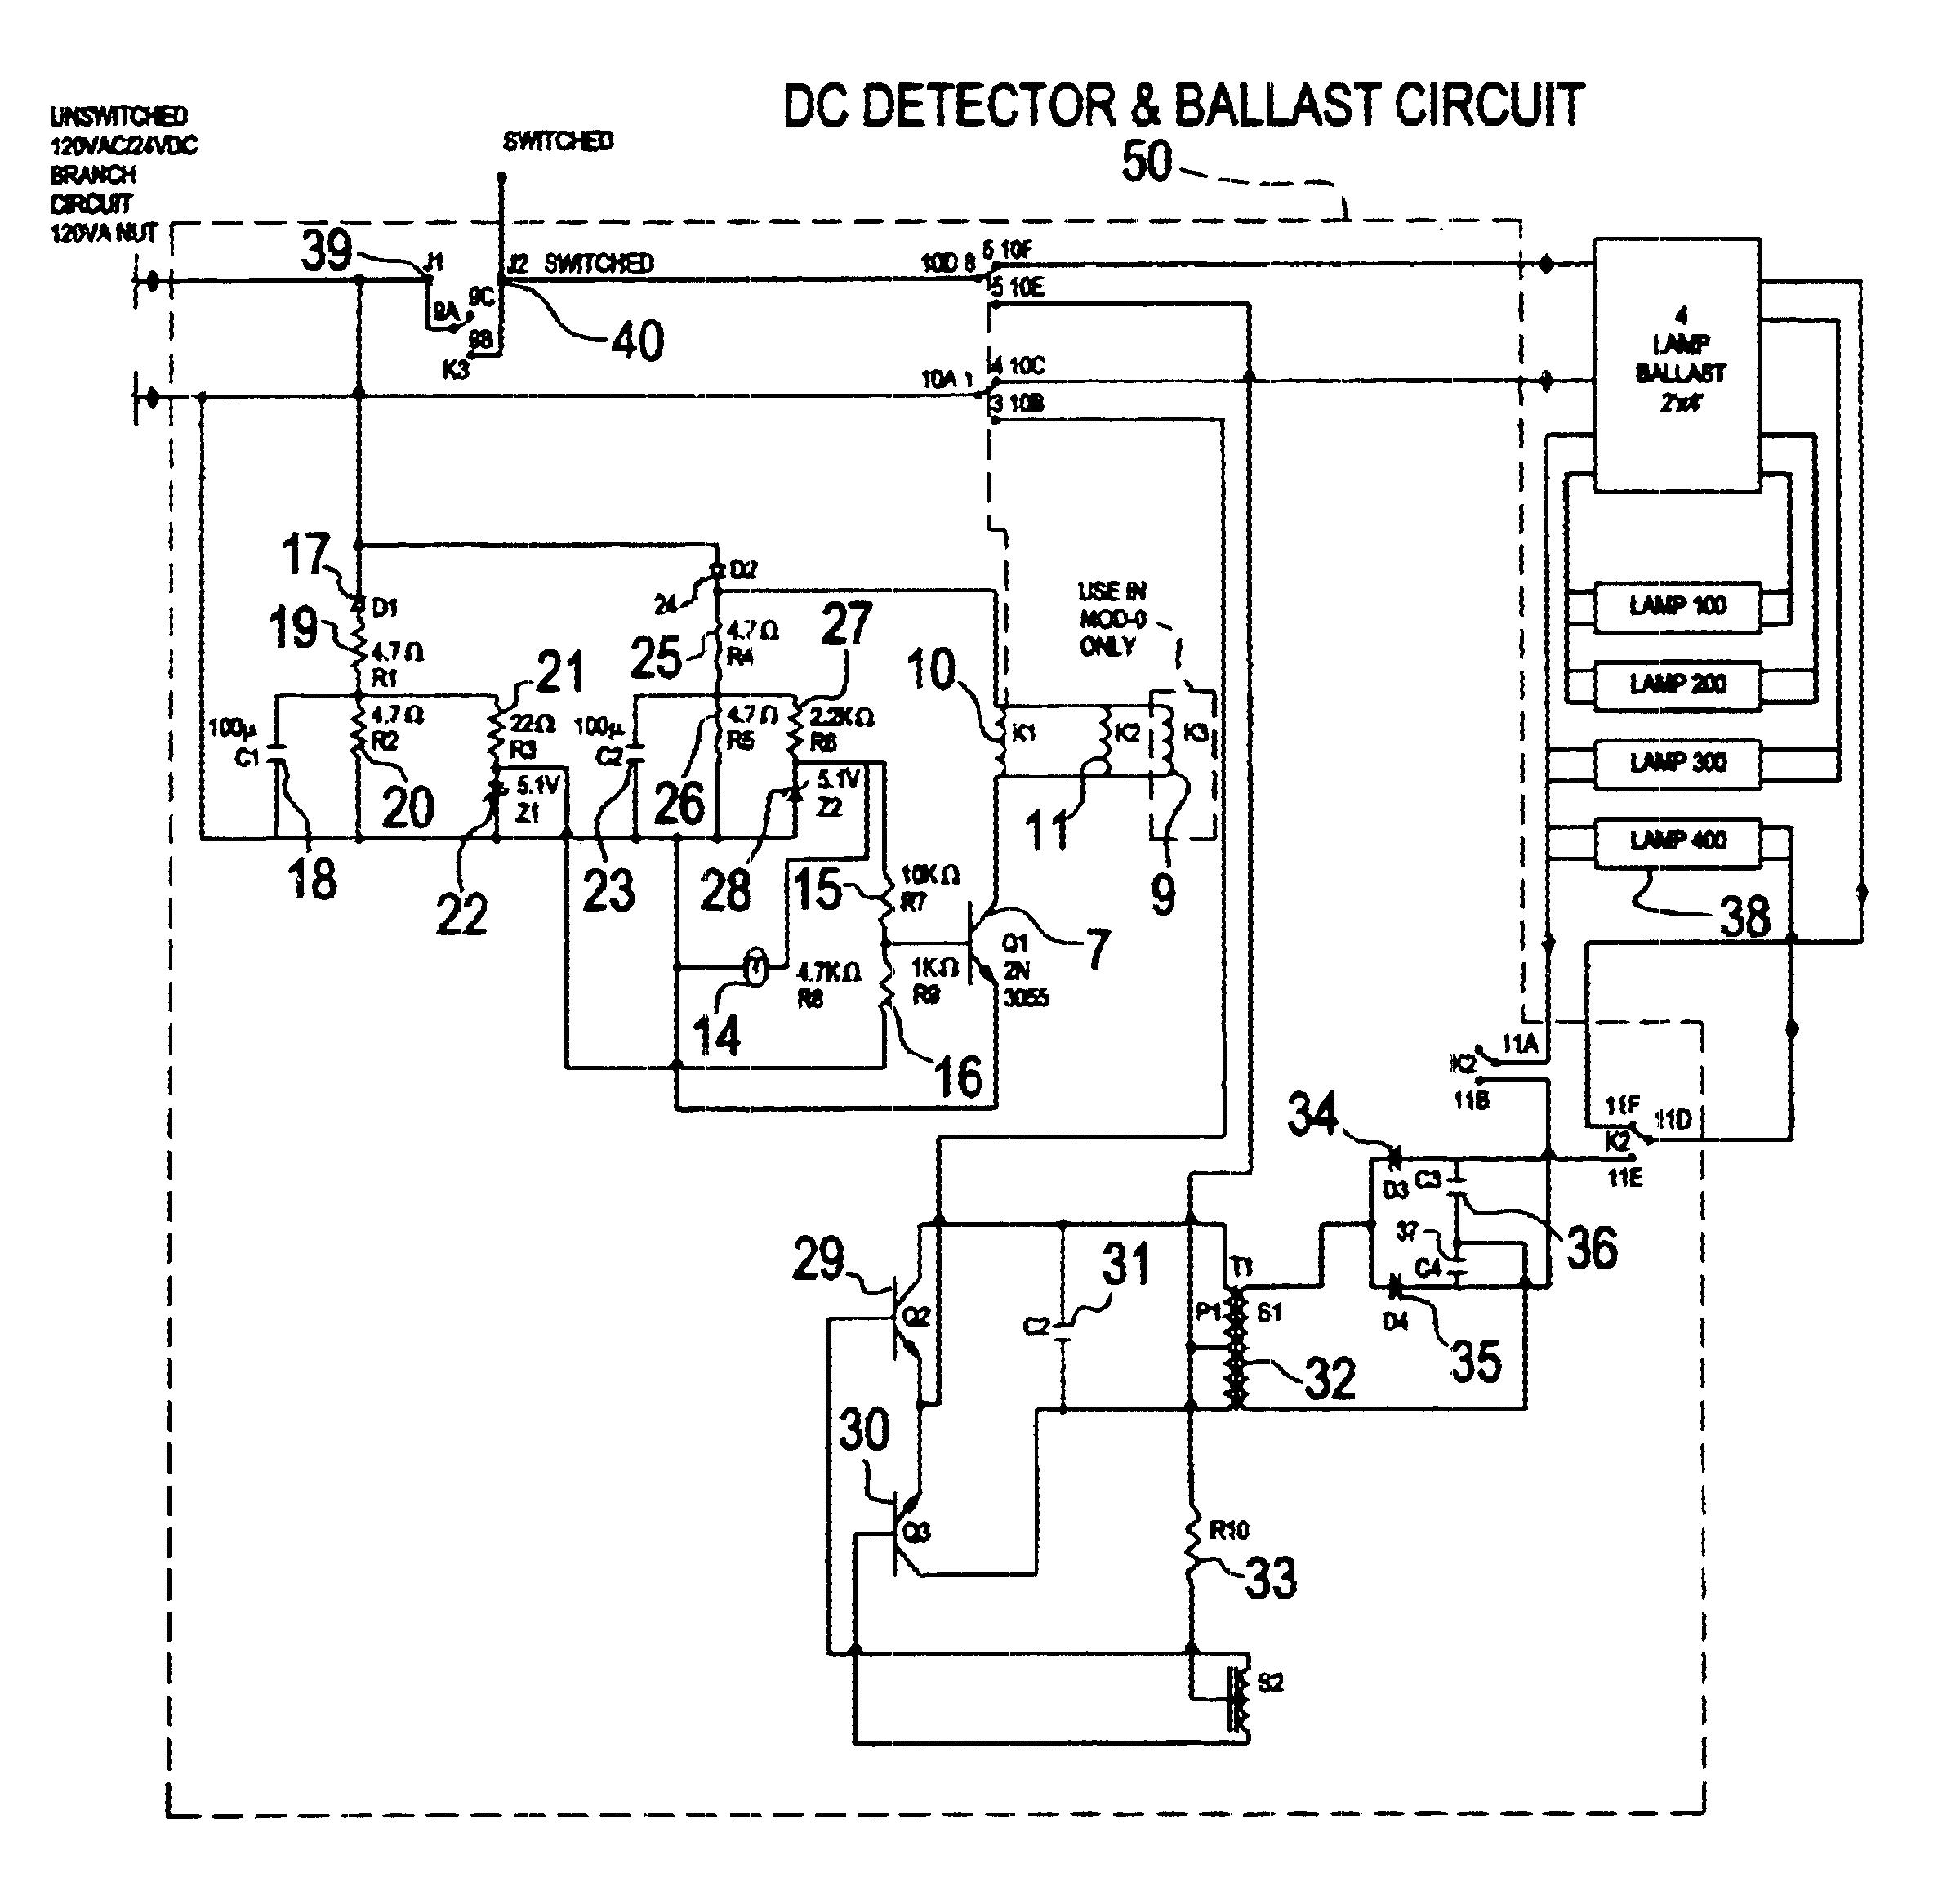 Kenworth T2000 Fuse Panel Location Smart Wiring Diagrams K100 Diagram T660 Headlight Circuit Maker W900 T800